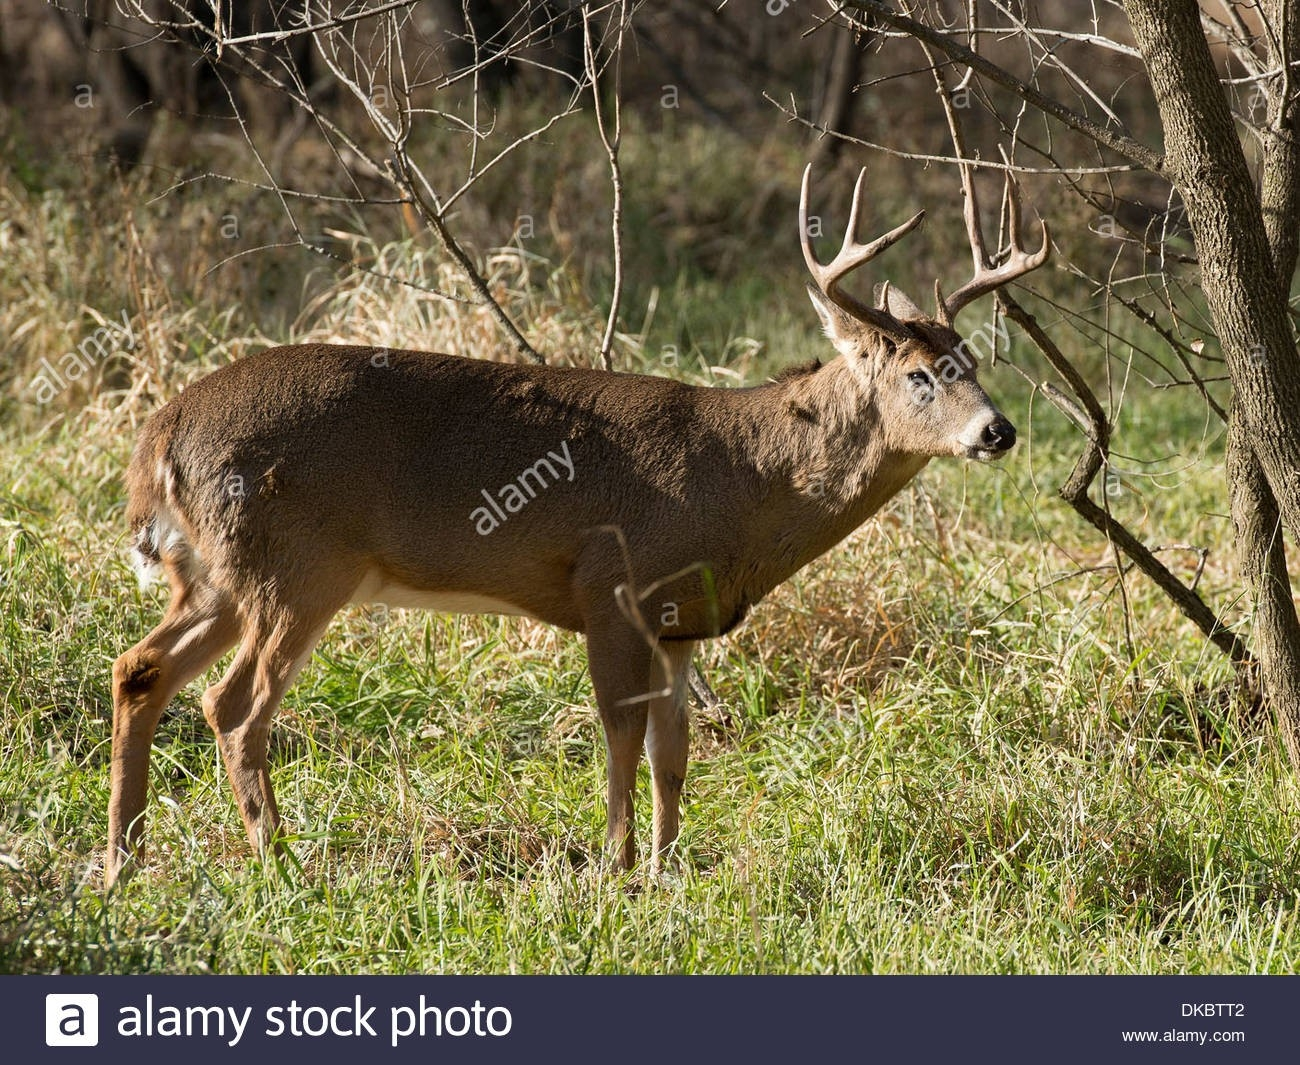 Whitetail Buck During The Rut In Minnesota Stock Photo: 63570530 - Alamy-Deer Rut Mn 2021